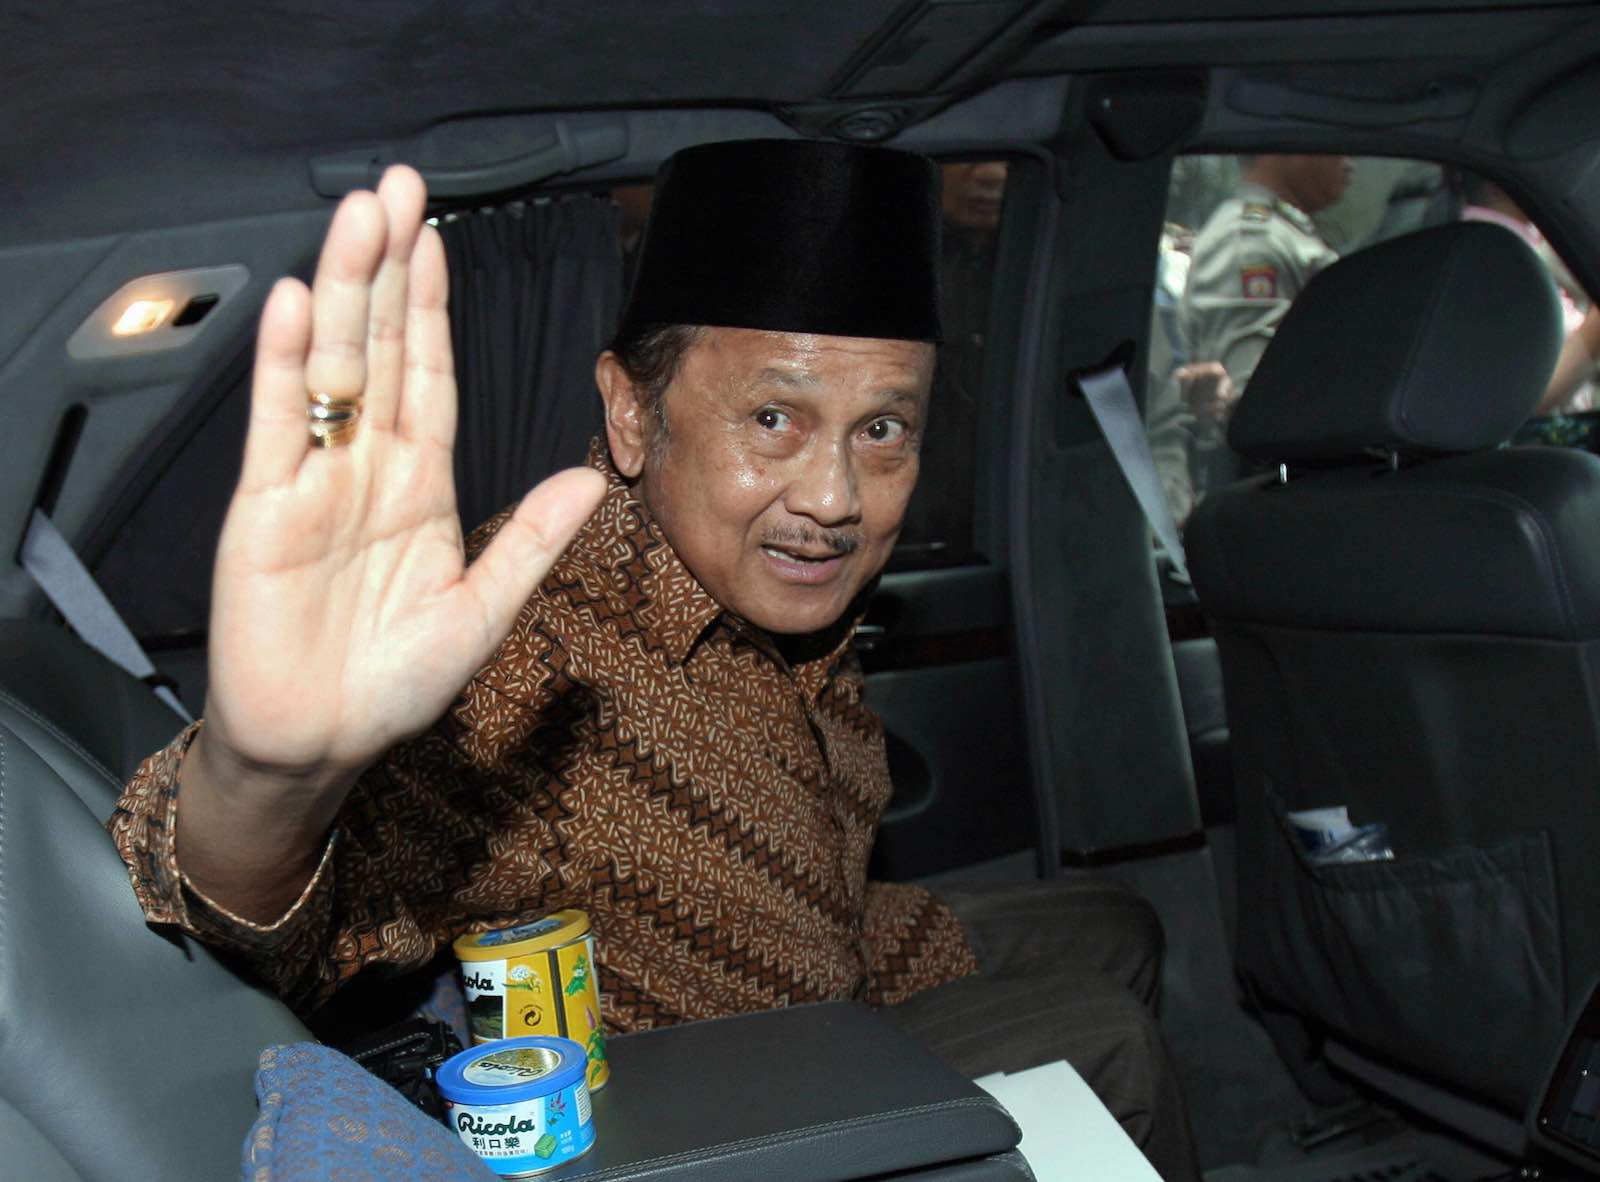 Former Indonesian President BJ Habibie in 2007 (Photo: Adek Berry via Getty)